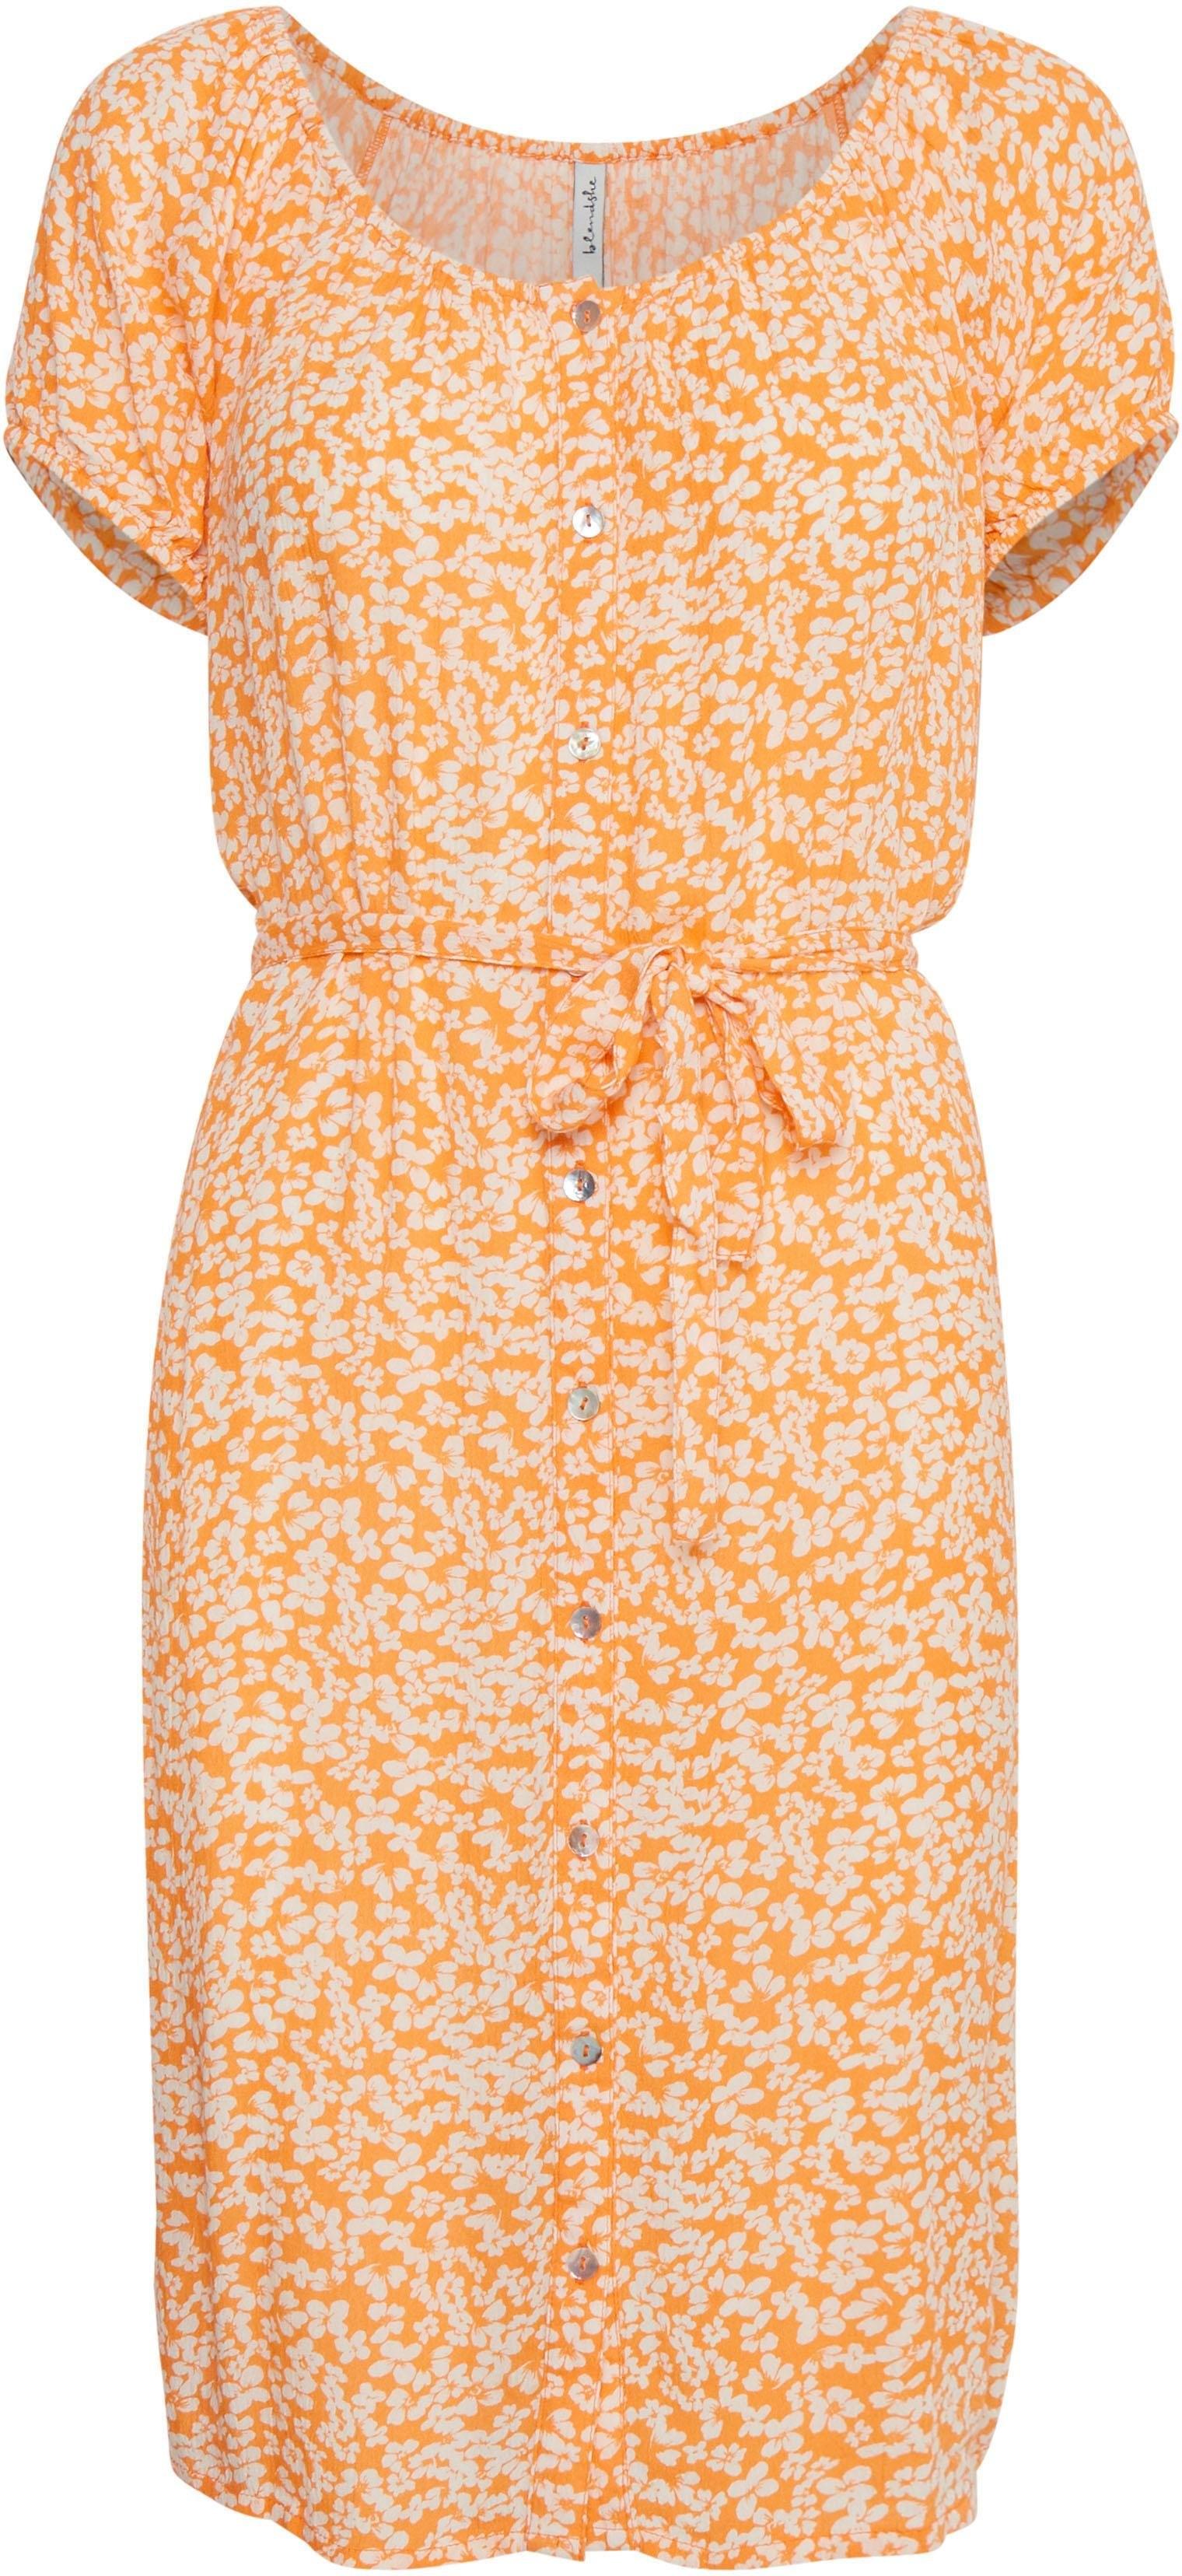 Blendshe blousejurkje nu online kopen bij OTTO